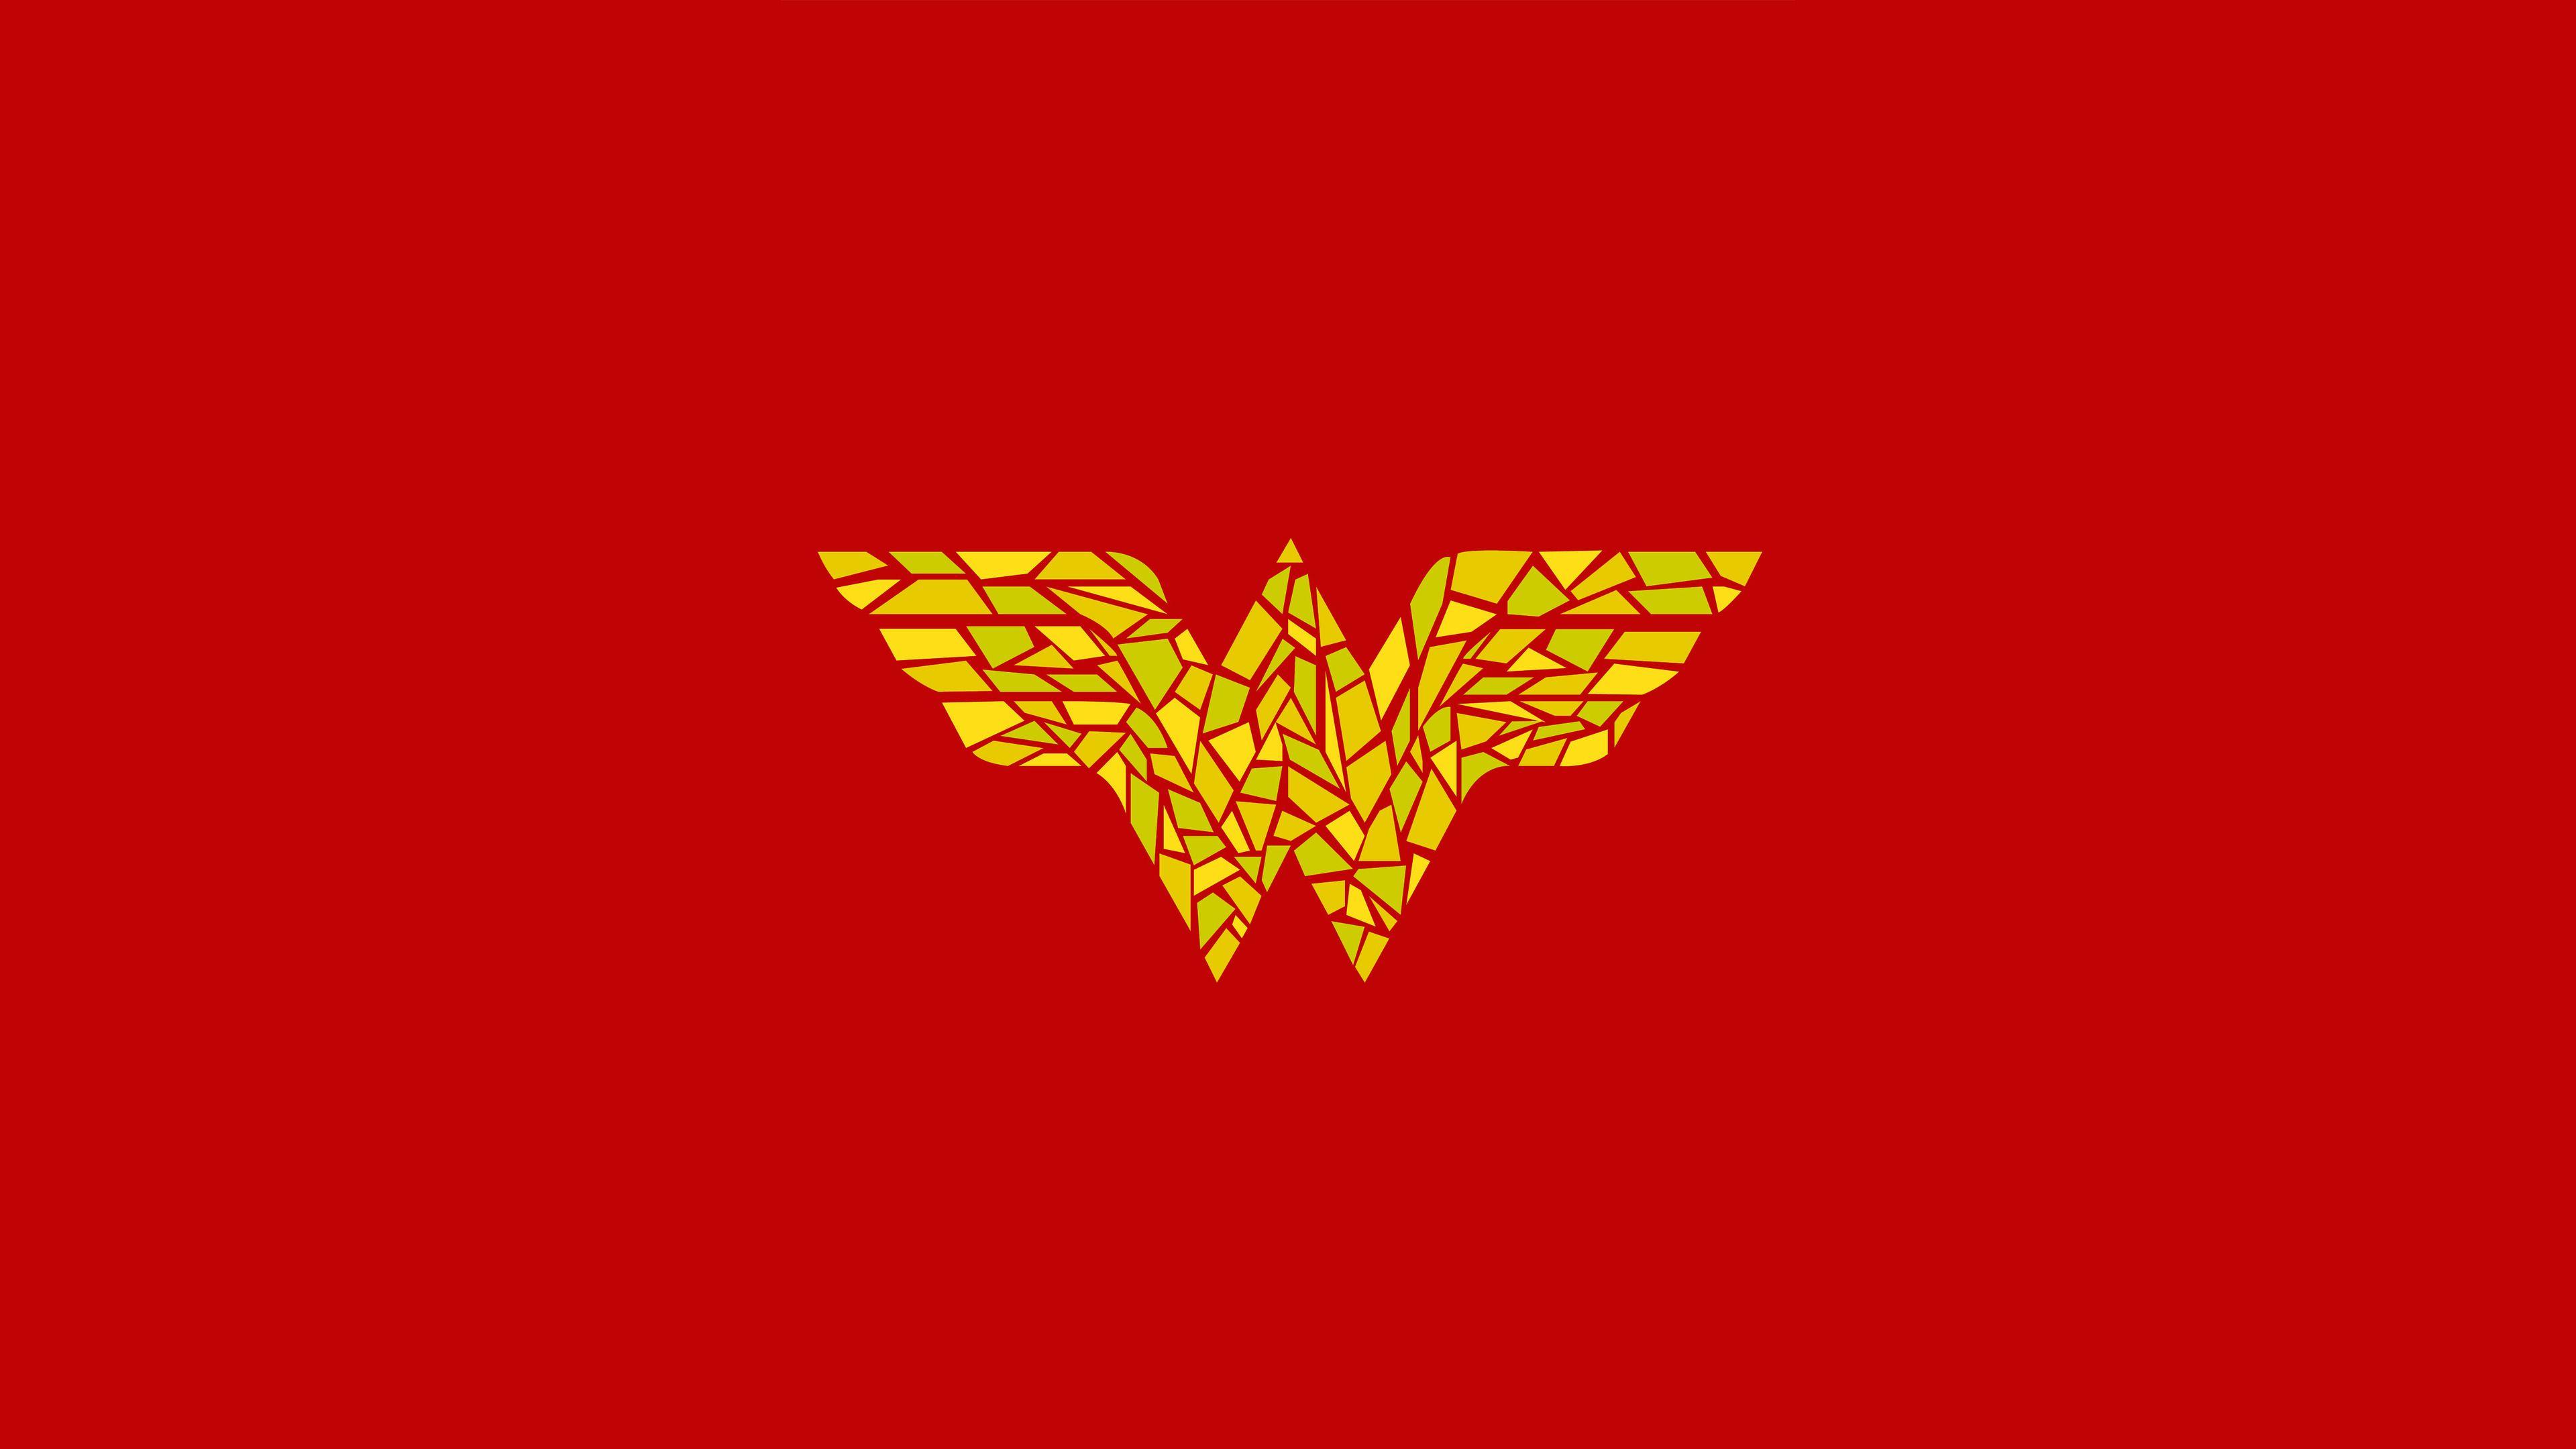 Wallpaper 4k Wonder Woman Logo Artwork 4kwallpapers, 5k